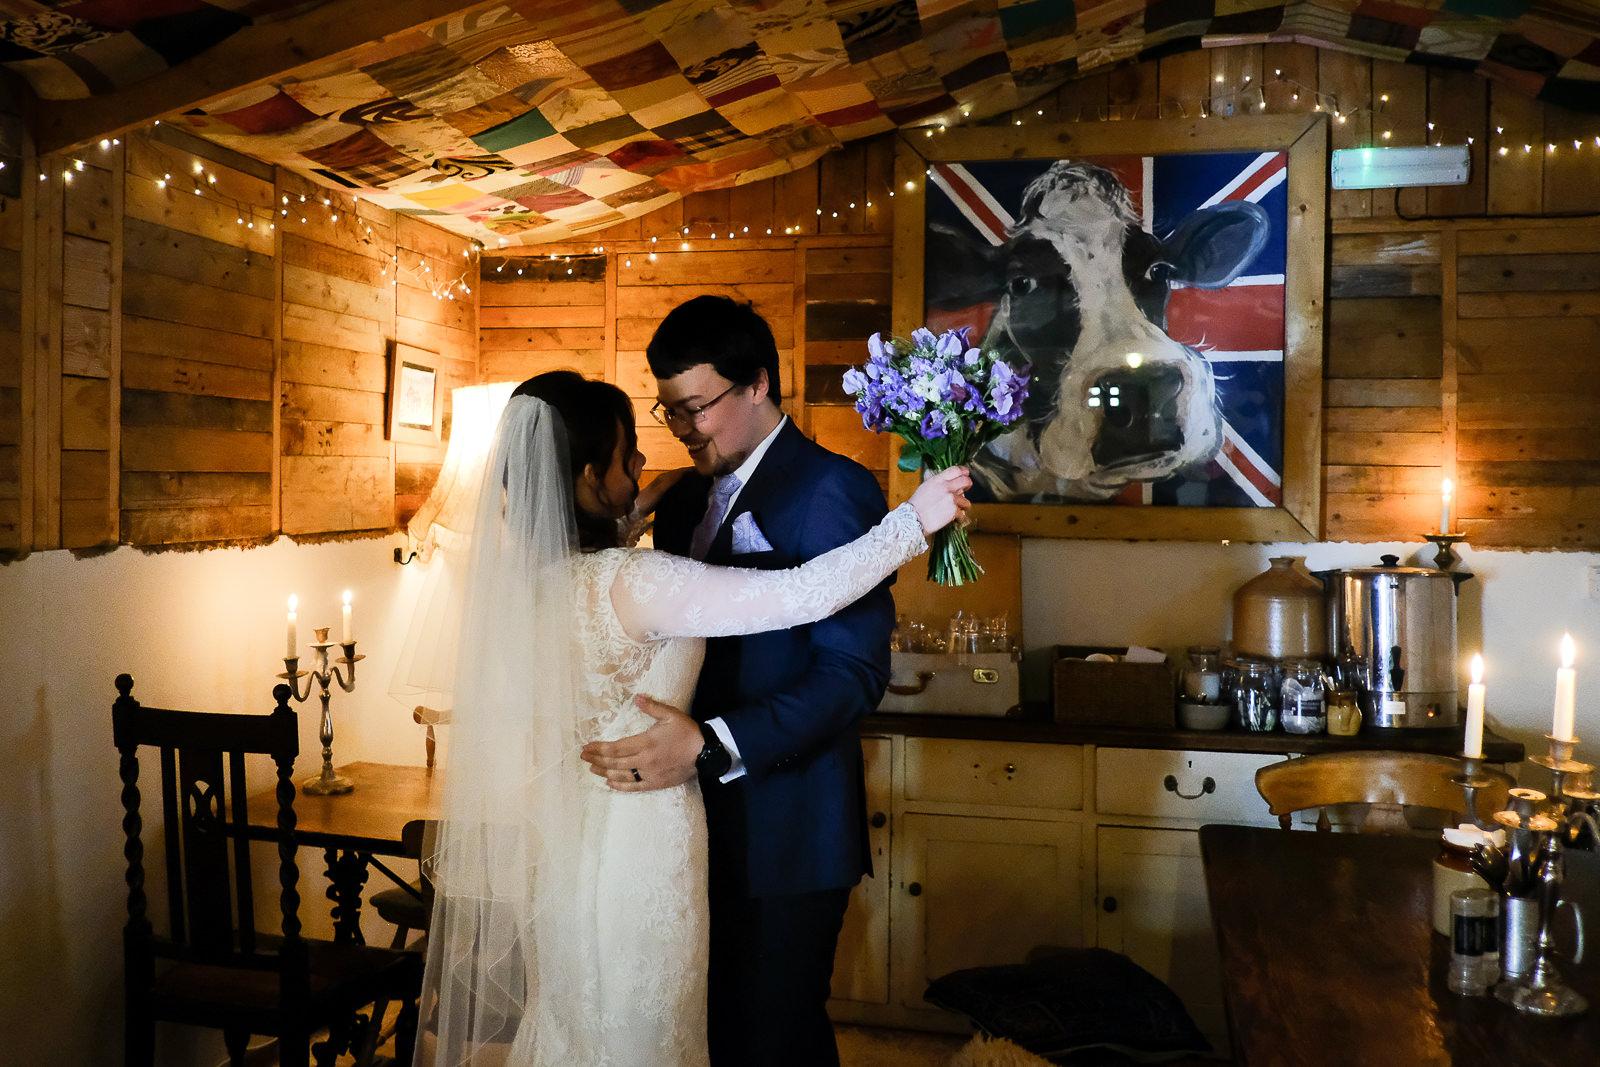 Retorrick Mill Newquay wedding 051.jpg